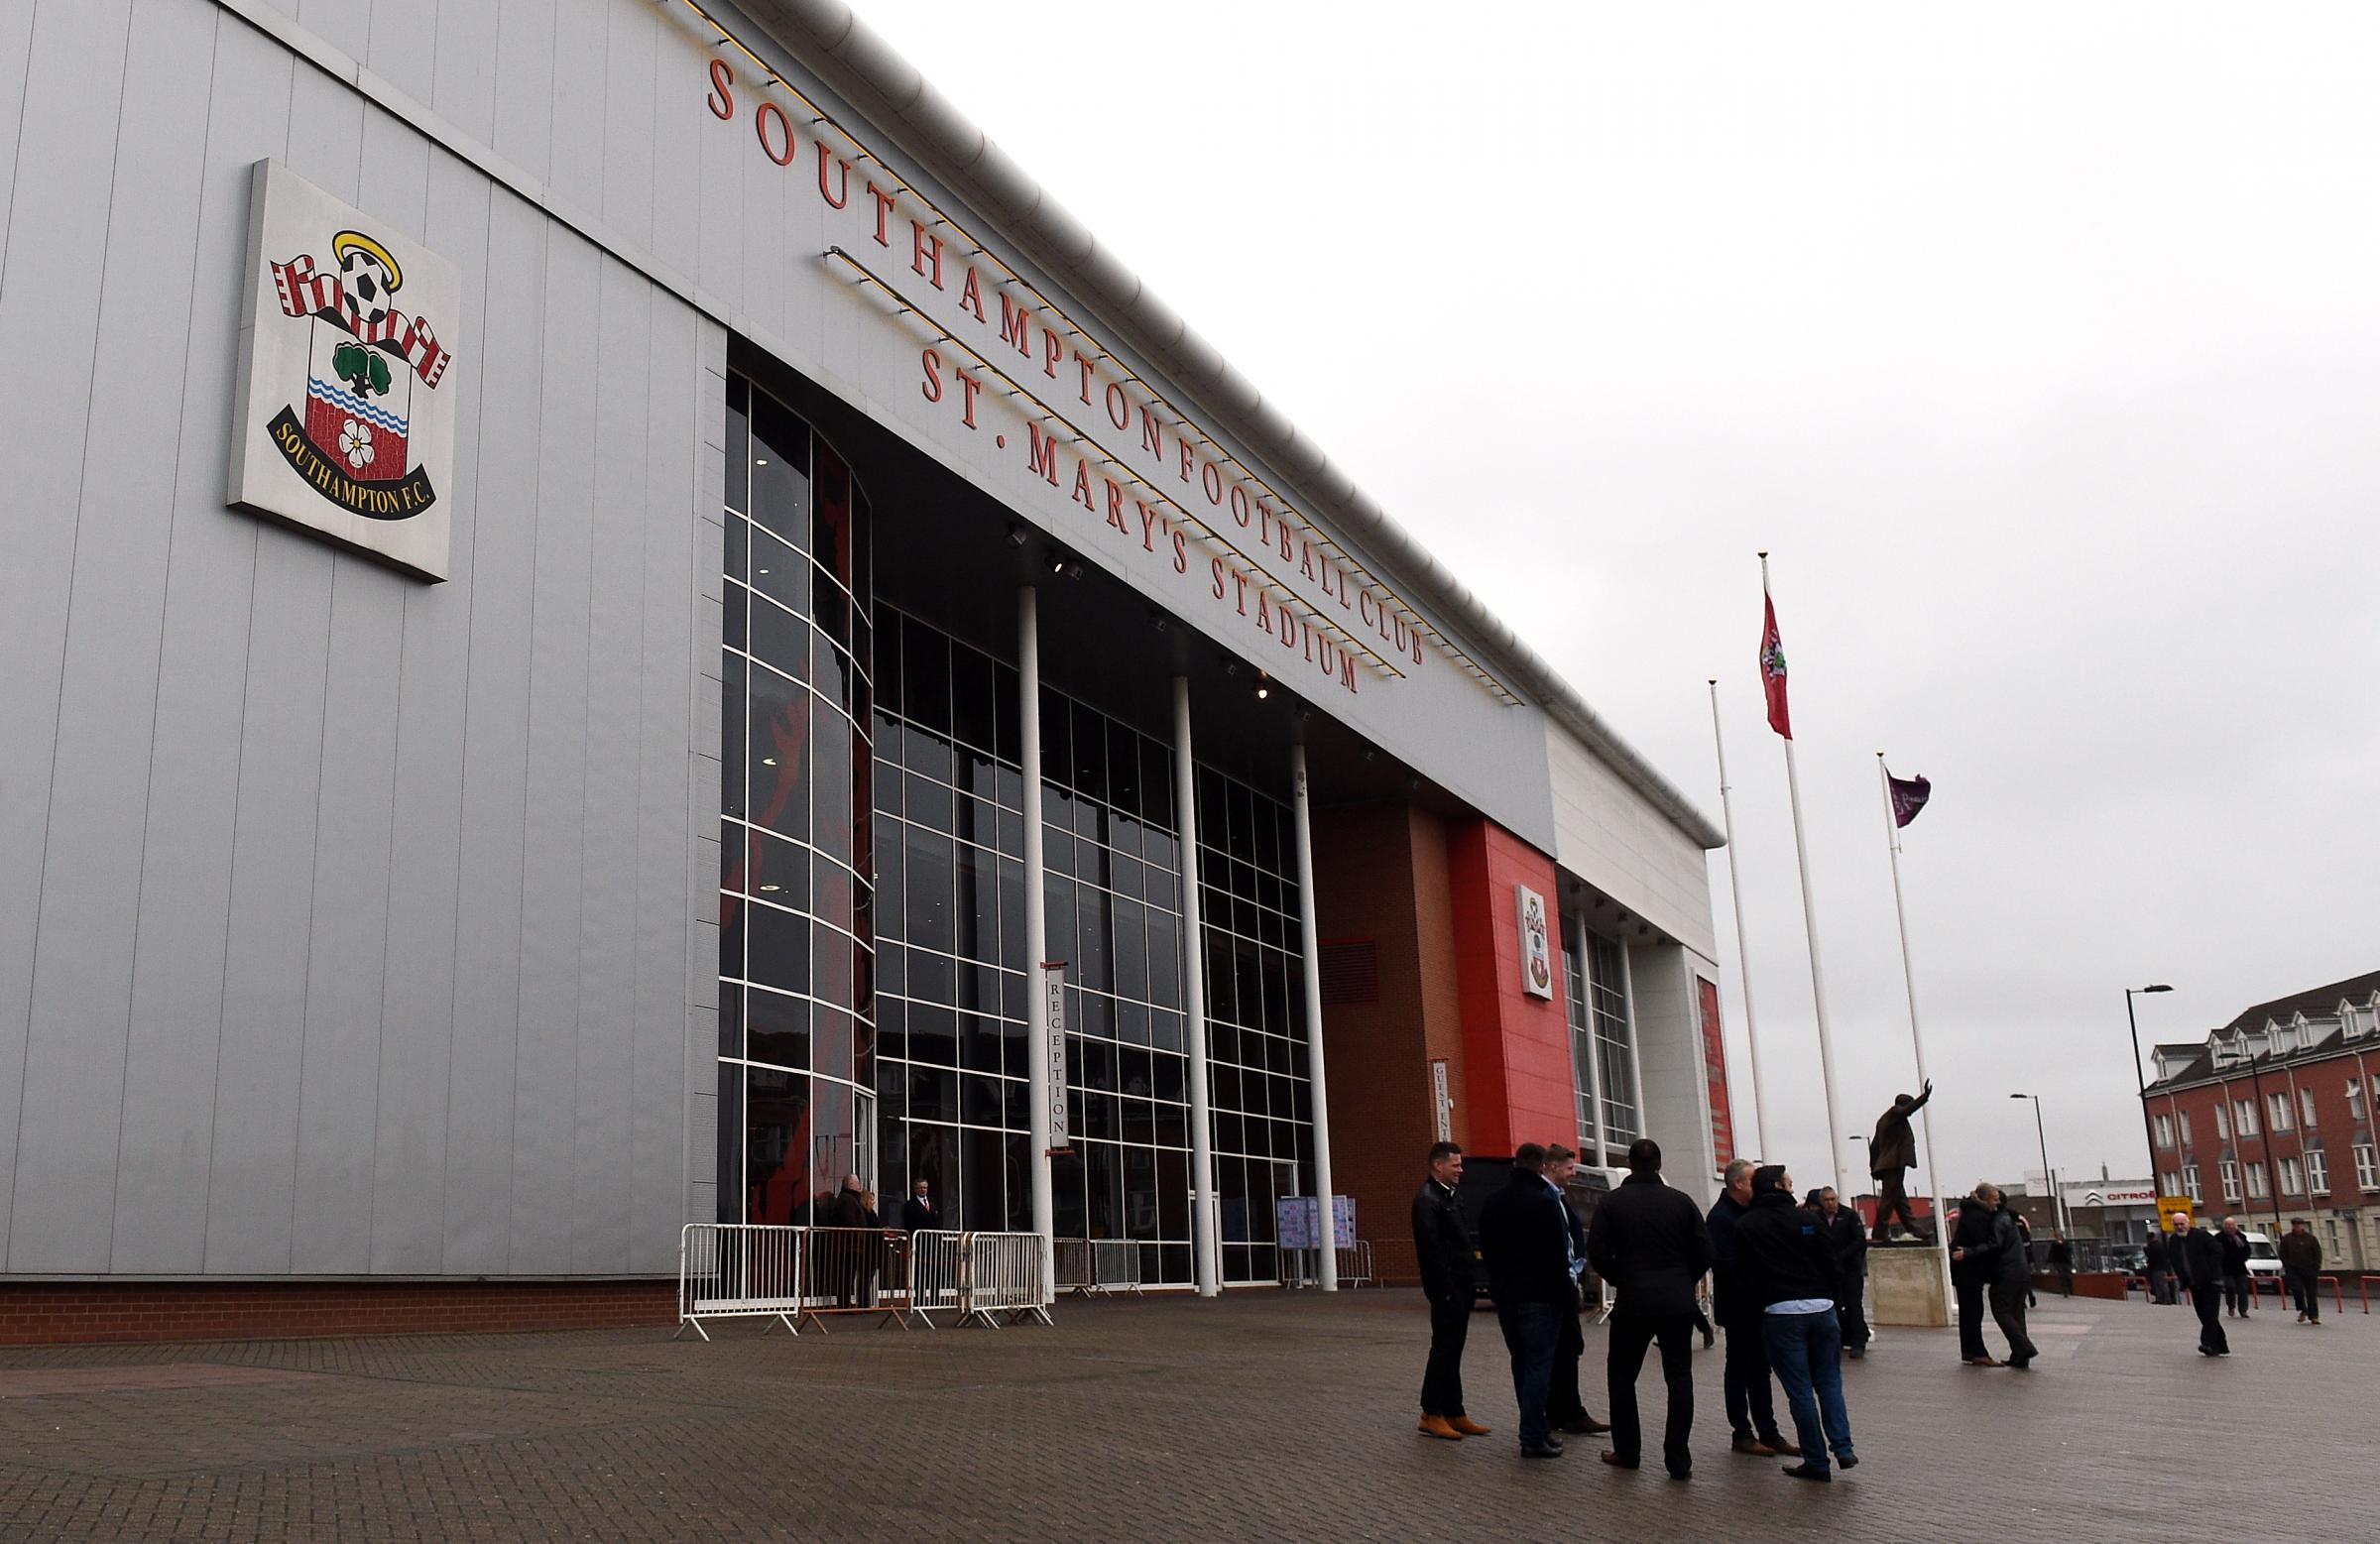 The Premier League has extended its suspension